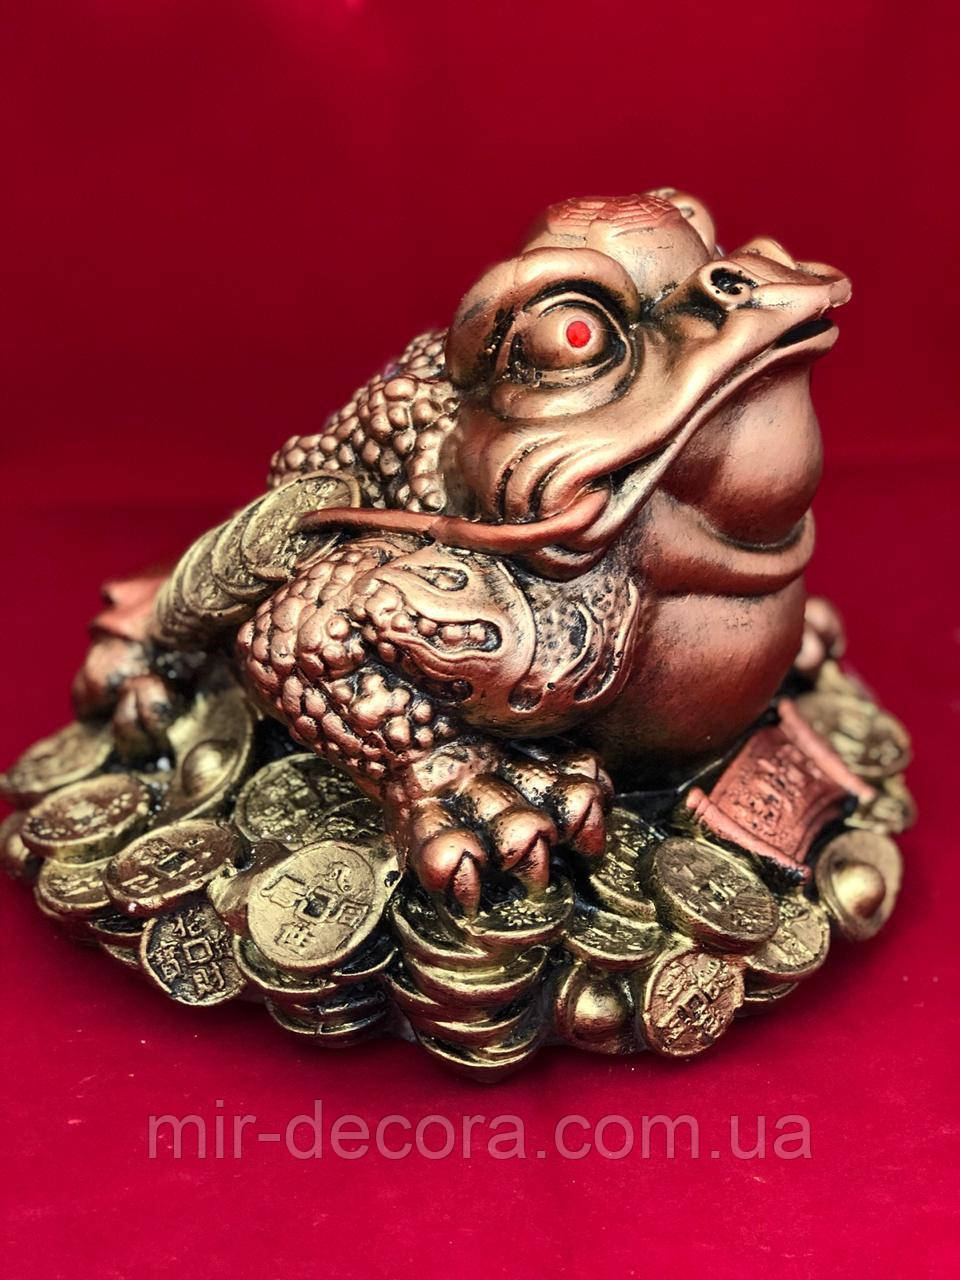 Статуэтка копилка Жаба богатства, 20 на 25 см